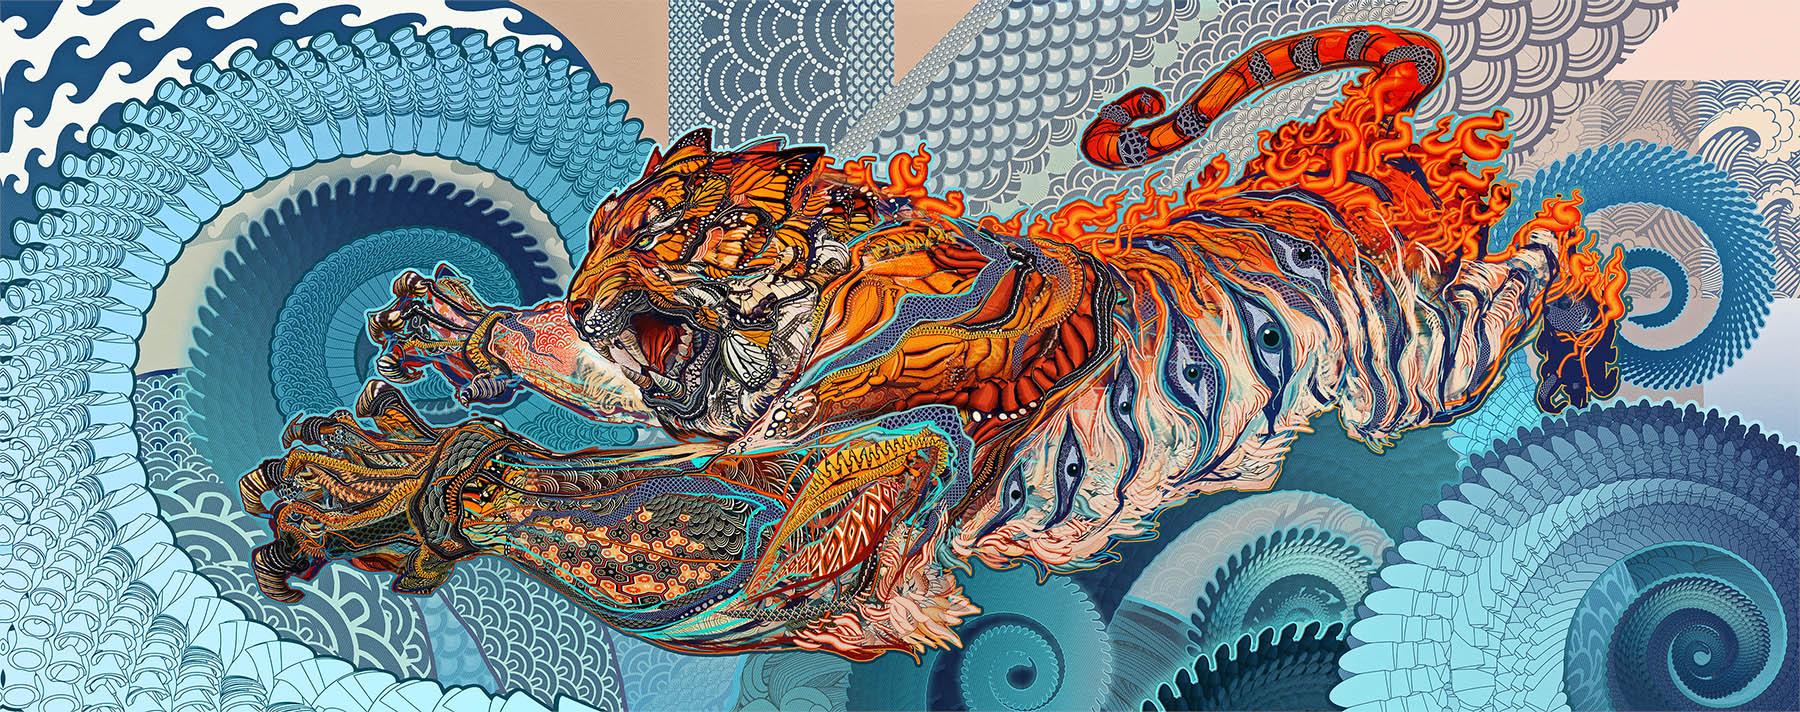 AJONES_wt__2015_tiger_swallowtail_aj.jpg